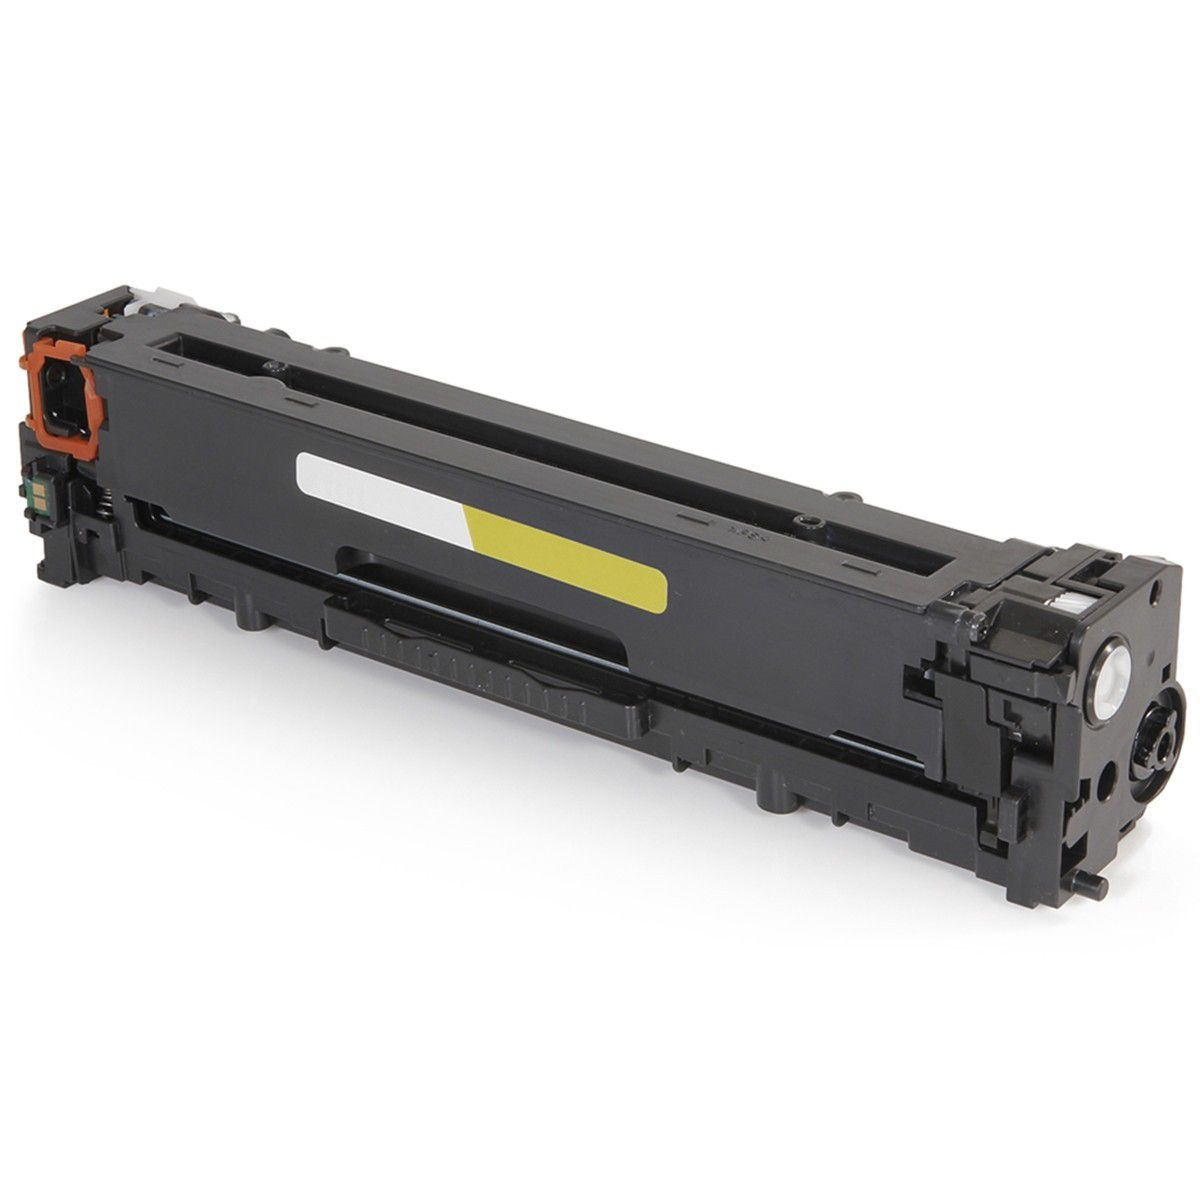 Toner Compatível HP CF212A 131A Yellow 1.400 Páginas - Cartucho & Cia